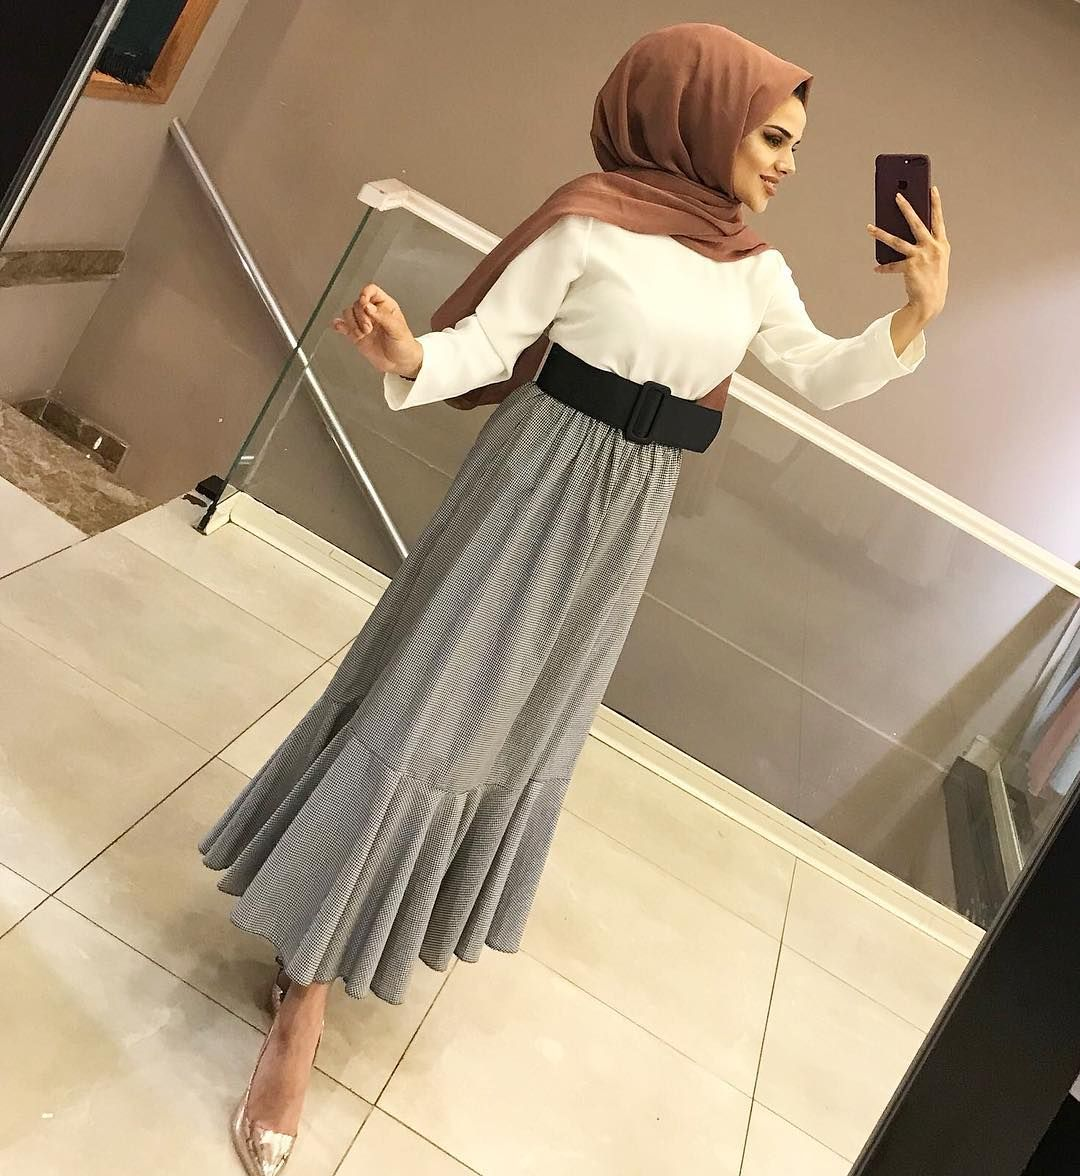 Tesettur Giyim Hijab Kiyafet Beautiful Elbise Gomlek Tesettur Islami Giyim Kiyafet Giyim